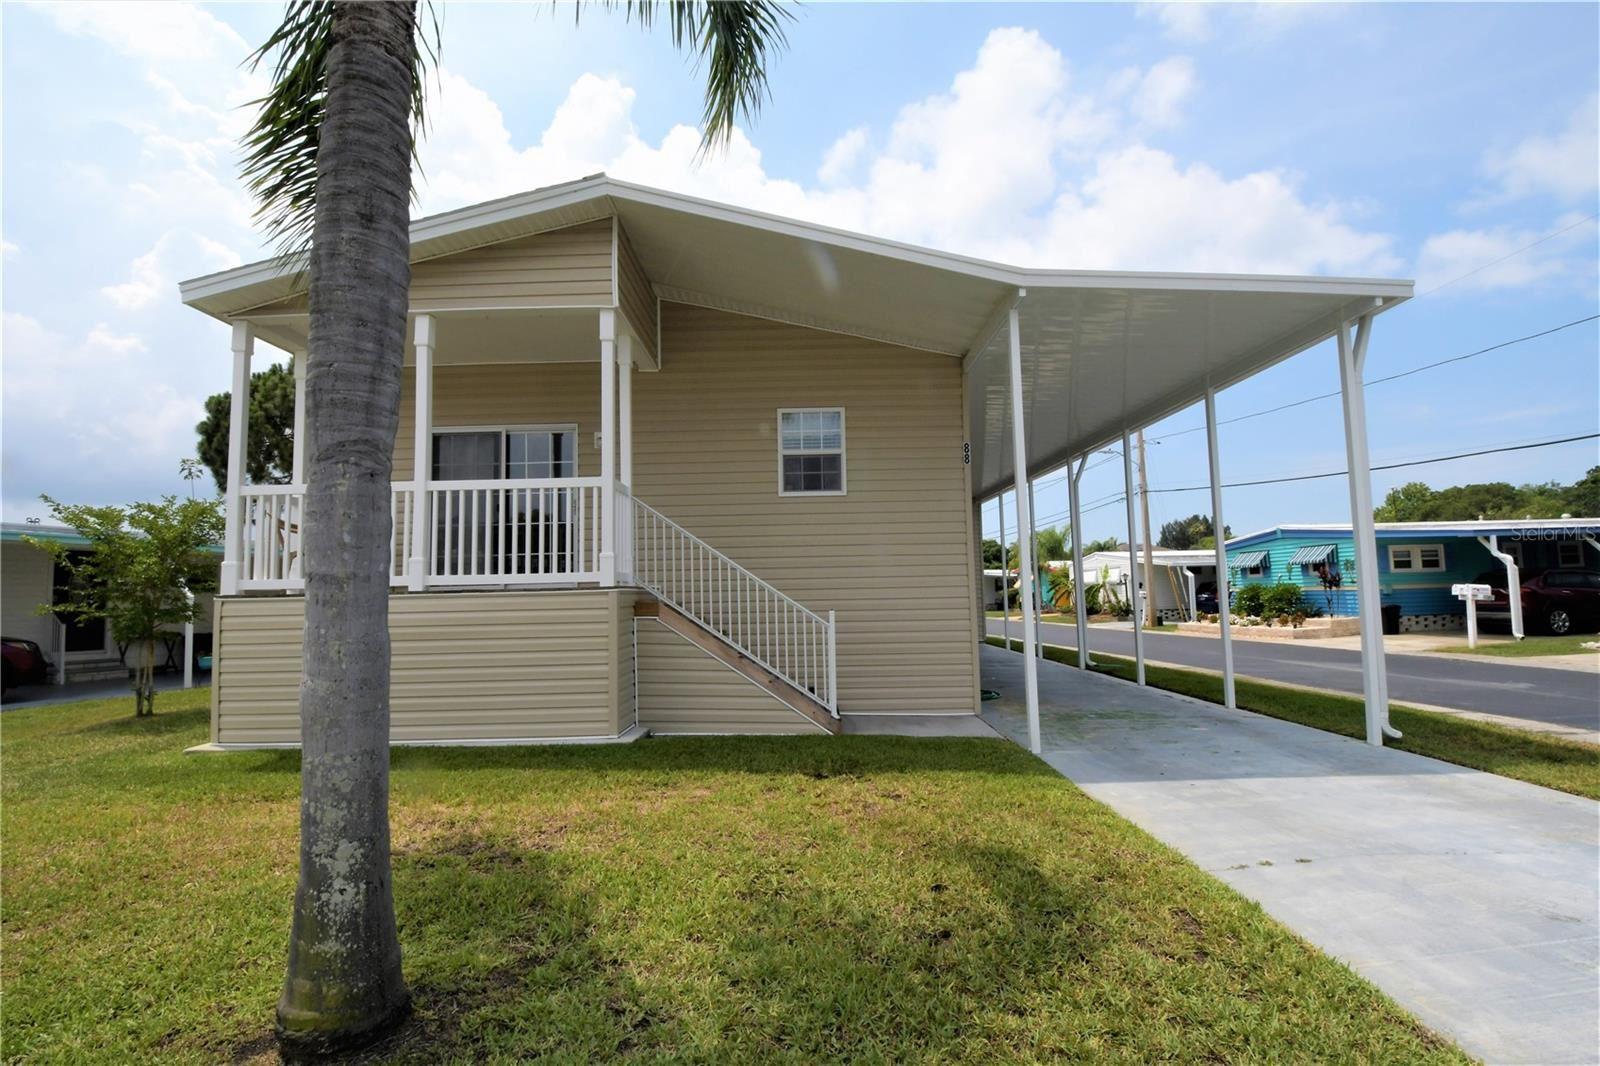 88 YAWL LANE #88, Palm Harbor, FL 34683 - #: U8122952